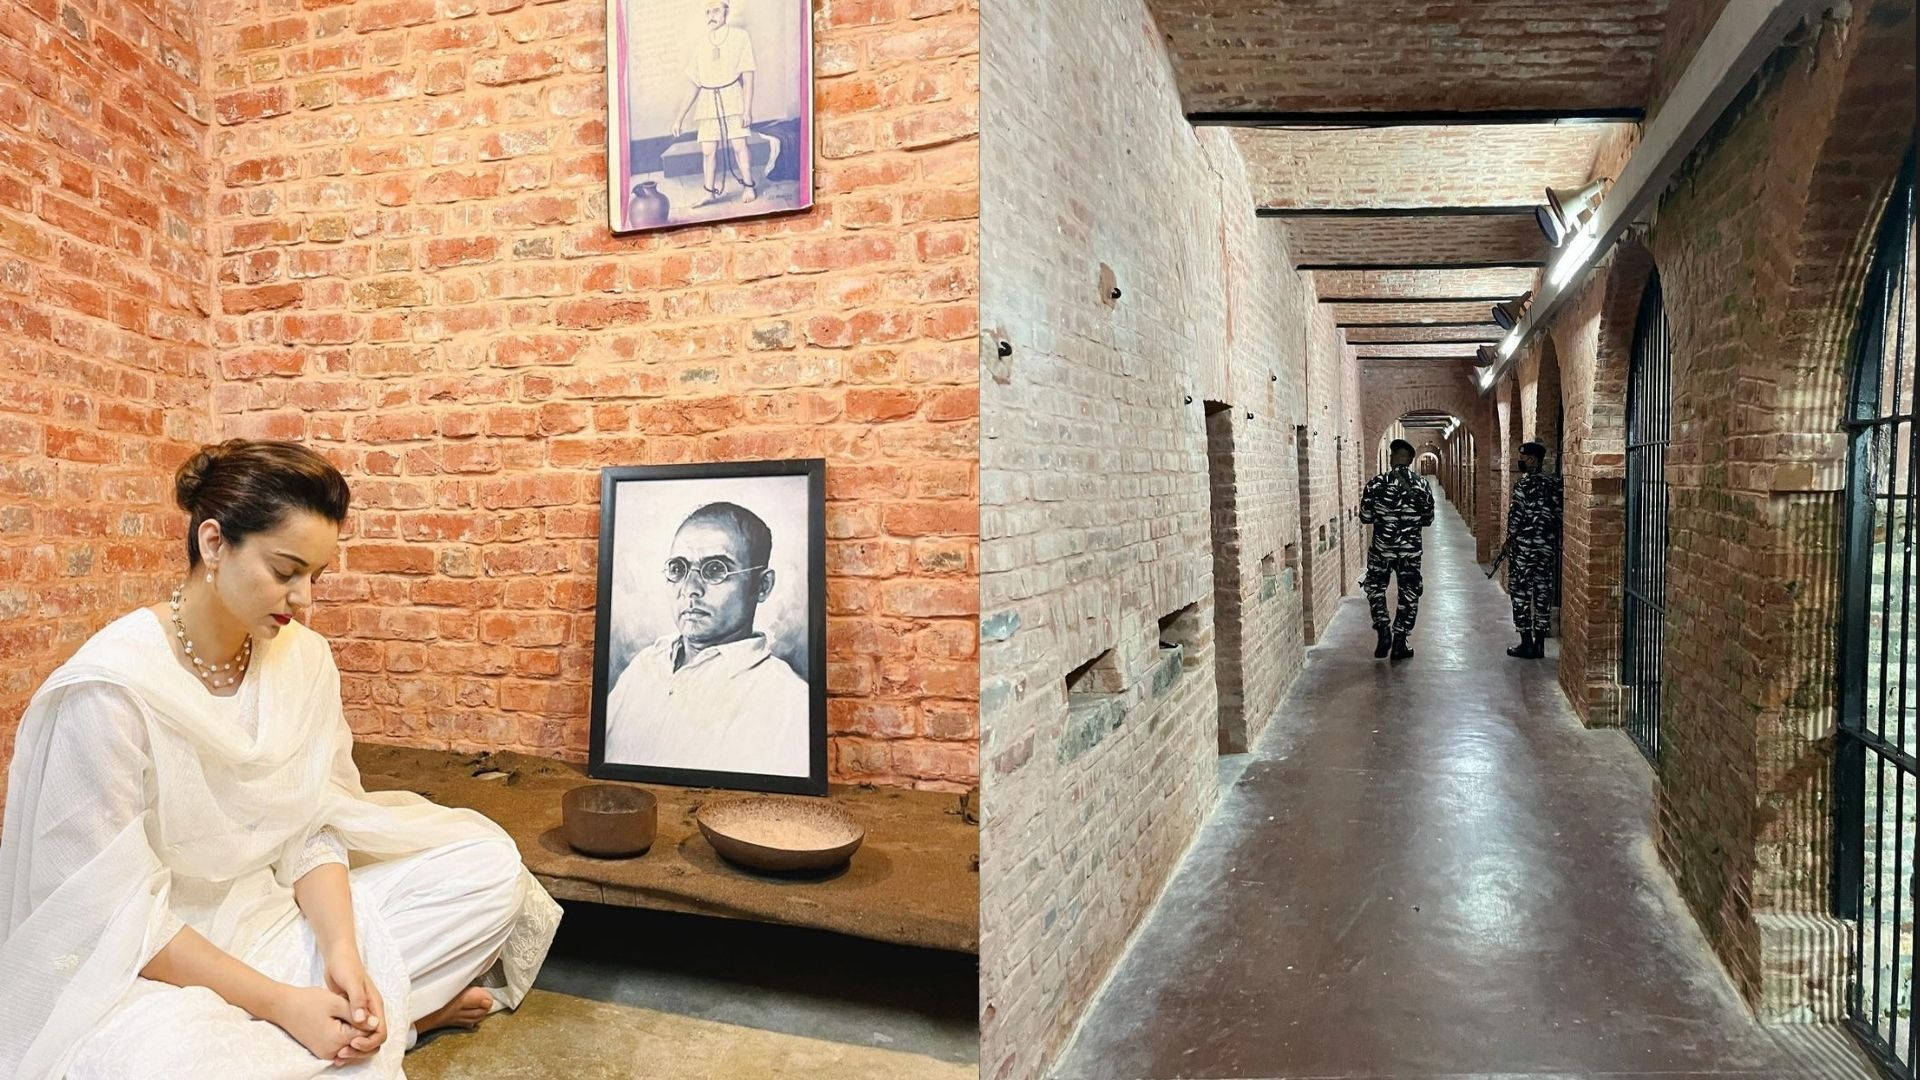 Kangana Ranaut Visits Cellular Jail In Kala Pani Amid Tejas Shoot To Pay Gratitude To Veer Savarkar Ji